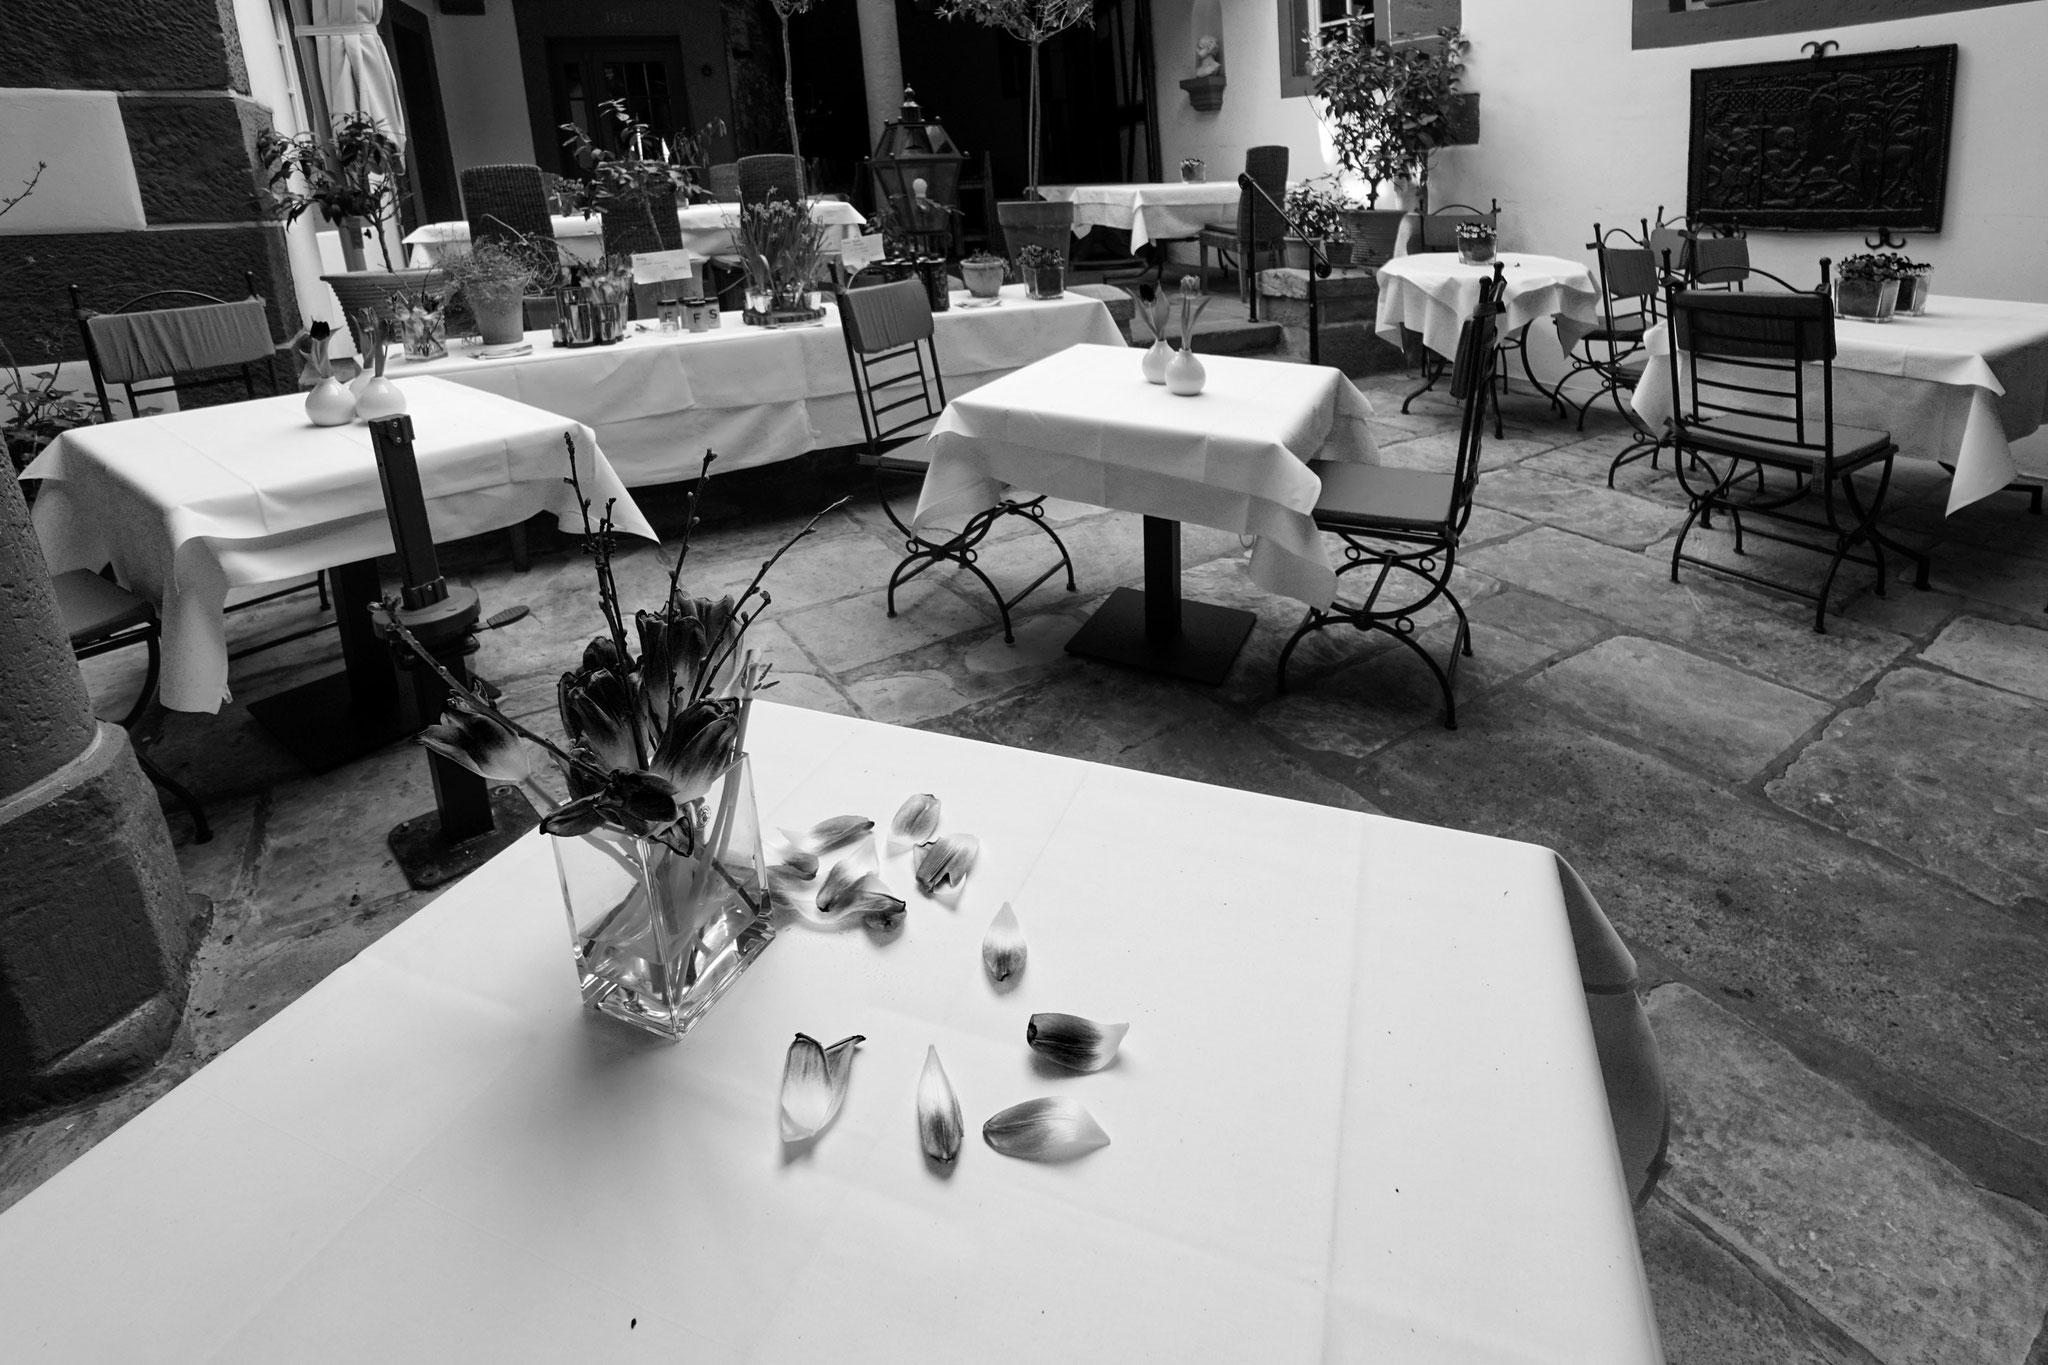 24.3.2020 | Großkarlbach | Restaurant Karlbacher |leere Tische